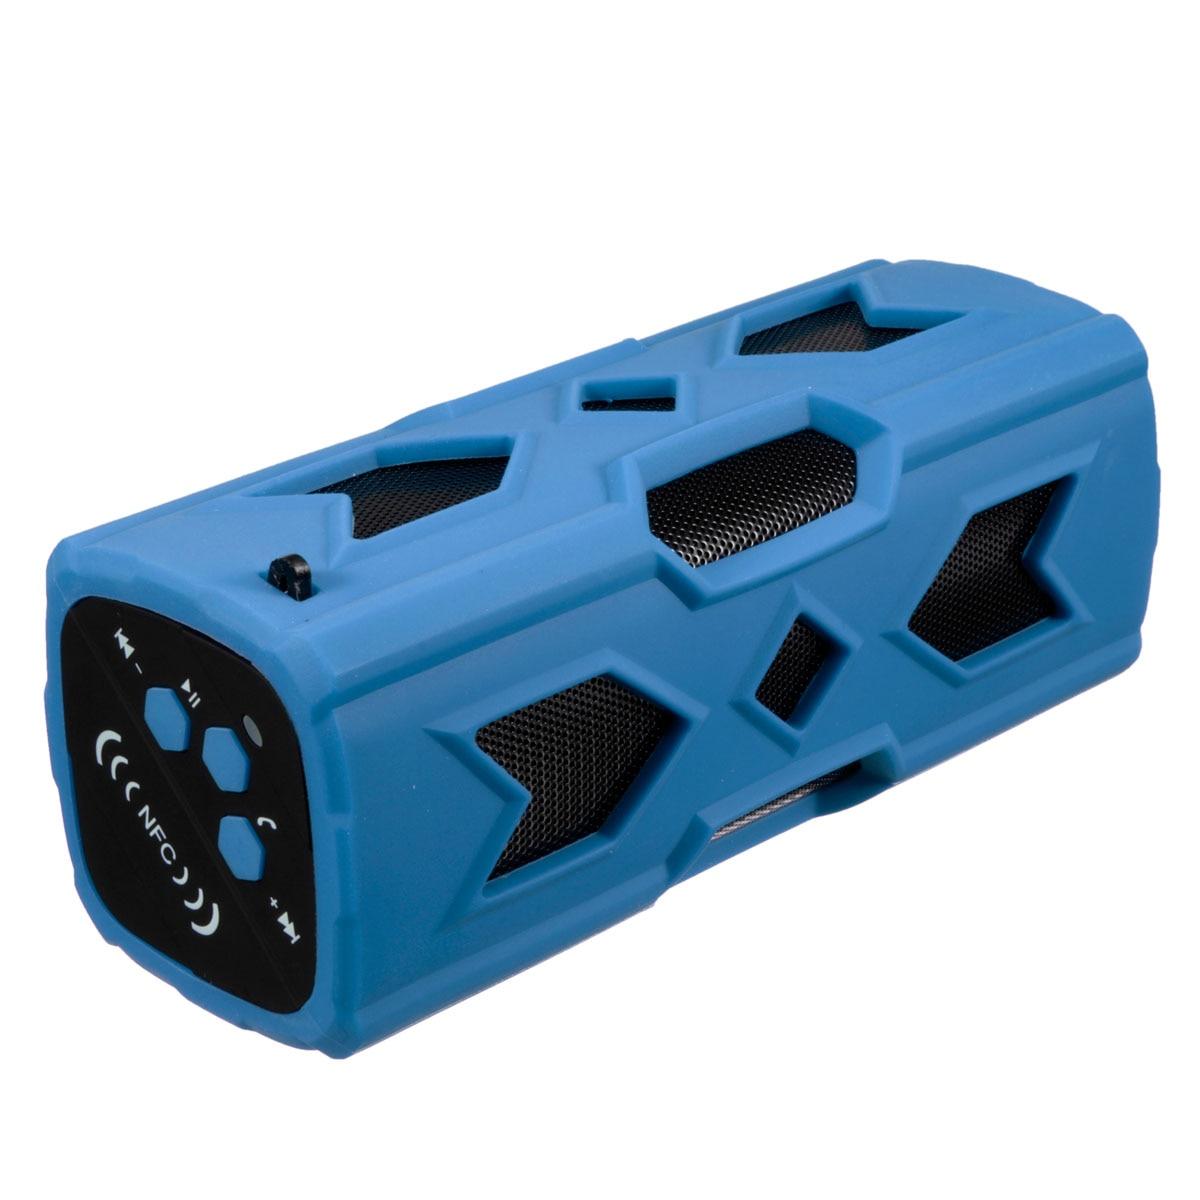 Top Quality IPX4 Waterproof Bluetooth CSR 4 0 NFC Speaker Portable Outdoor Music Soundbox 3600mah font